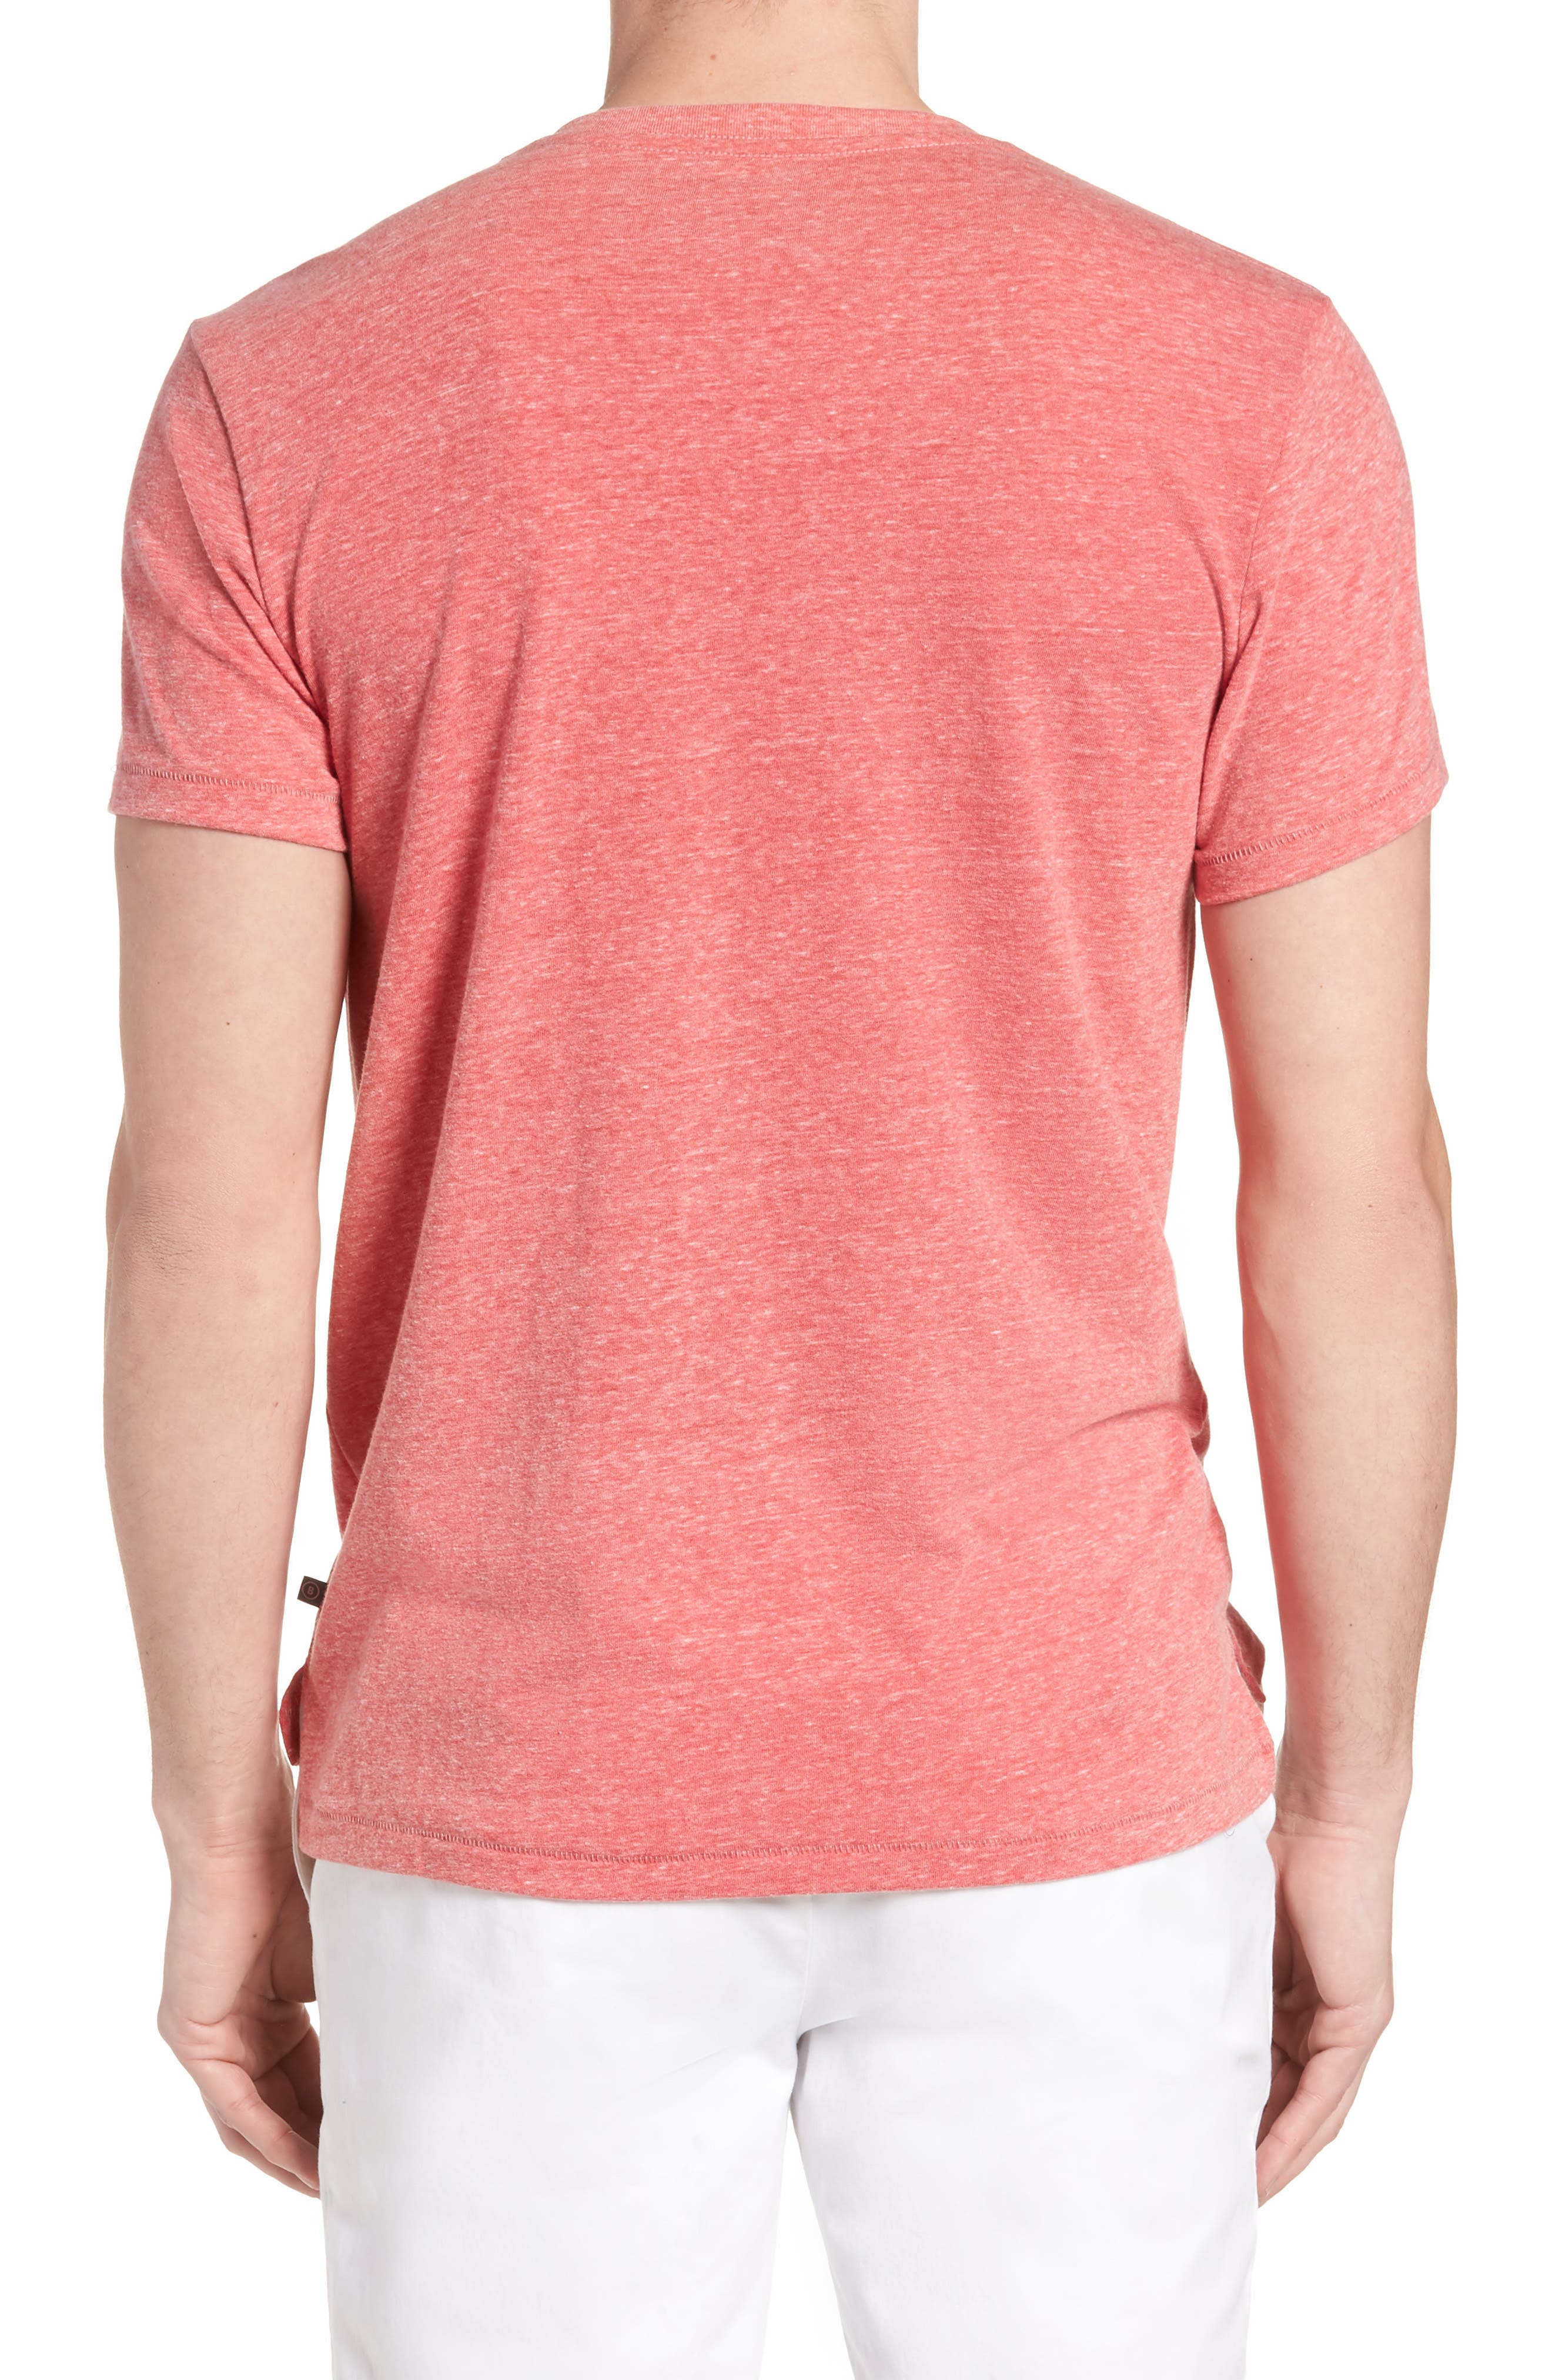 LA Slim Fit Heathered T-Shirt,                             Alternate thumbnail 6, color,